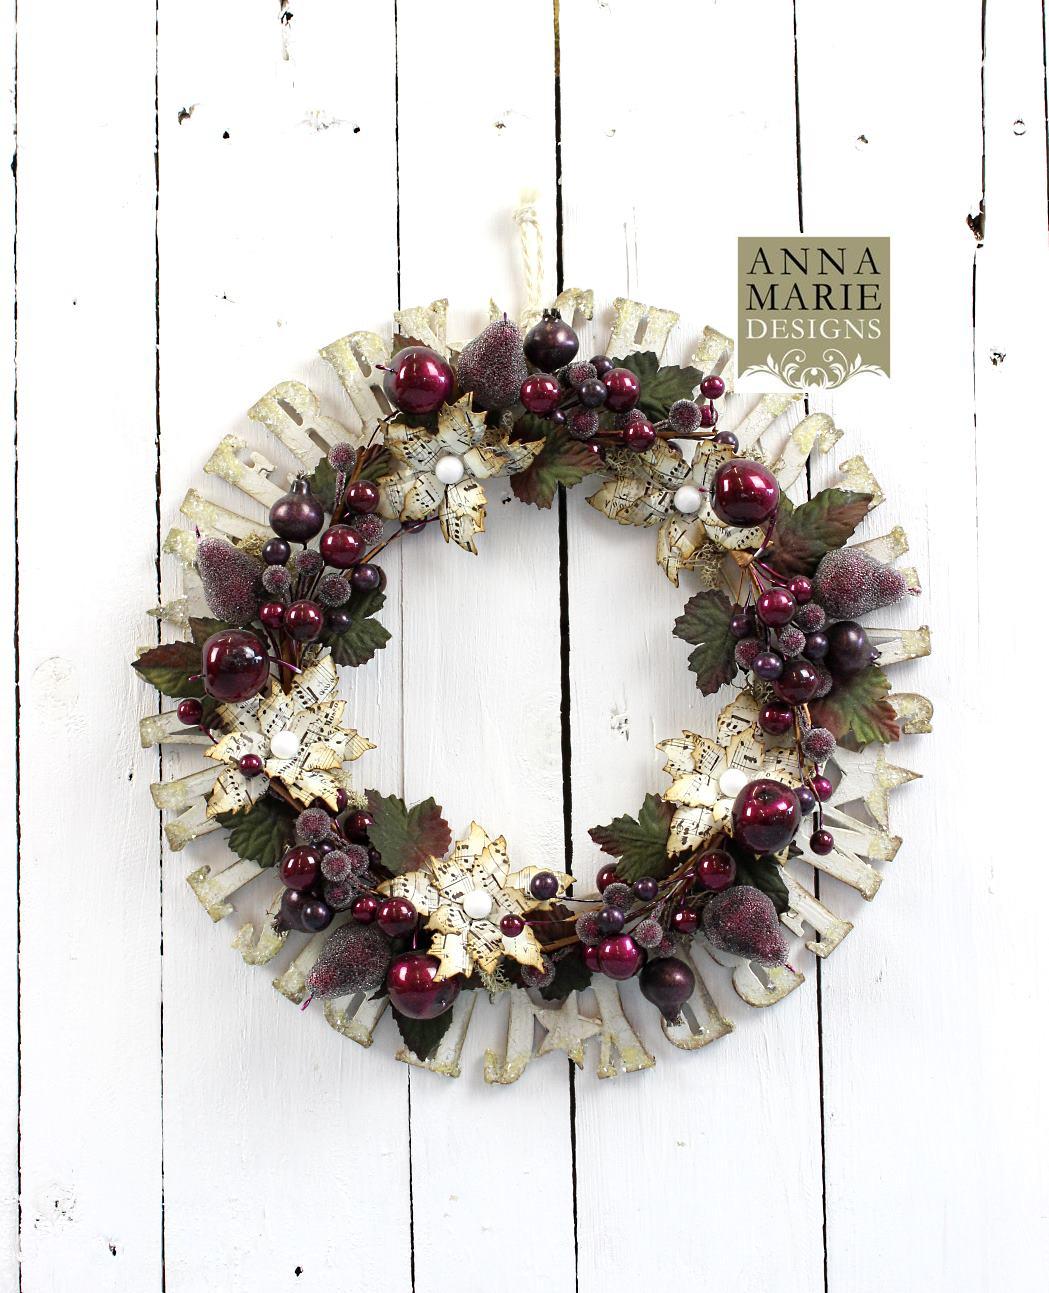 MDF Merry Christmas Wreath - Anna Marie Designs